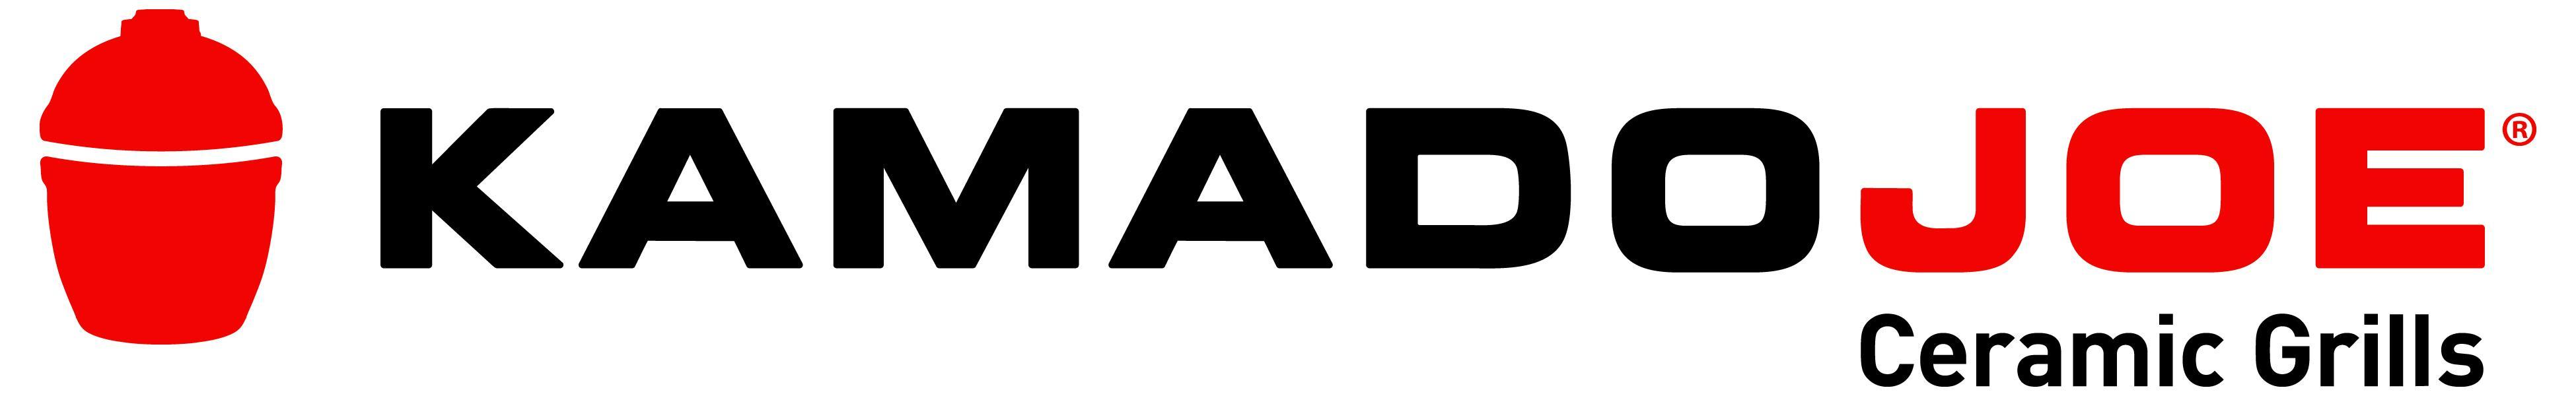 kjo-logo-horizontal-tag-cmyk.jpg